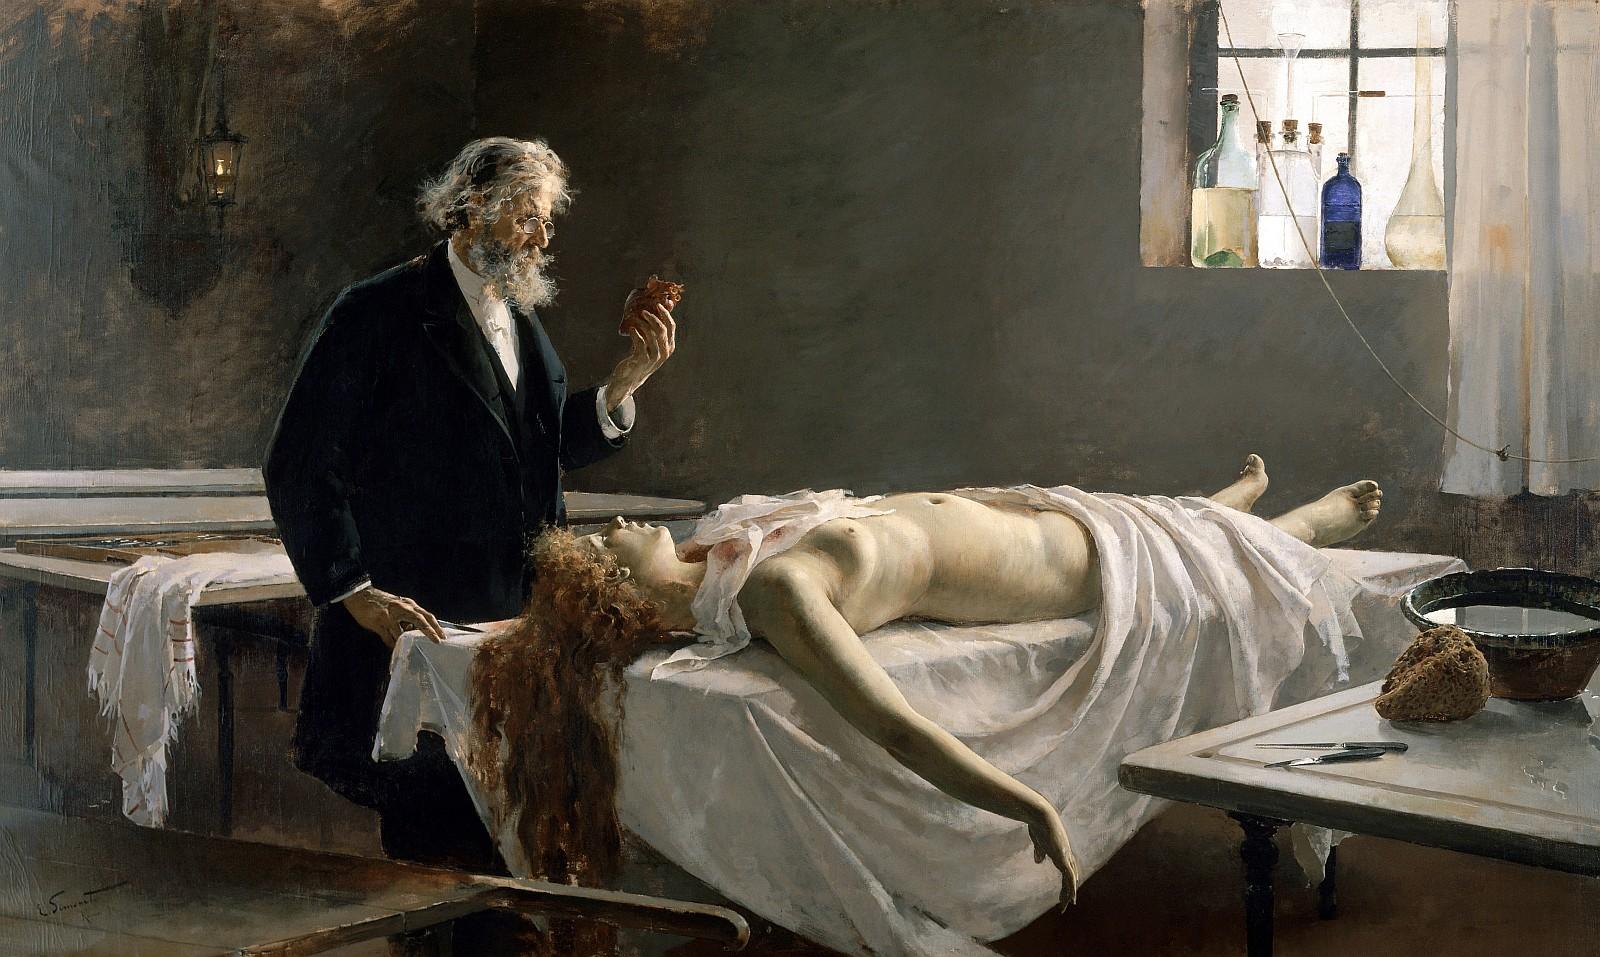 http://1.bp.blogspot.com/-Ca7r2940GTw/UY5n-7mmRSI/AAAAAAAABxA/KTcBep2Bpvw/s1600/Enrique-Simonet-autopsia-1890.jpg